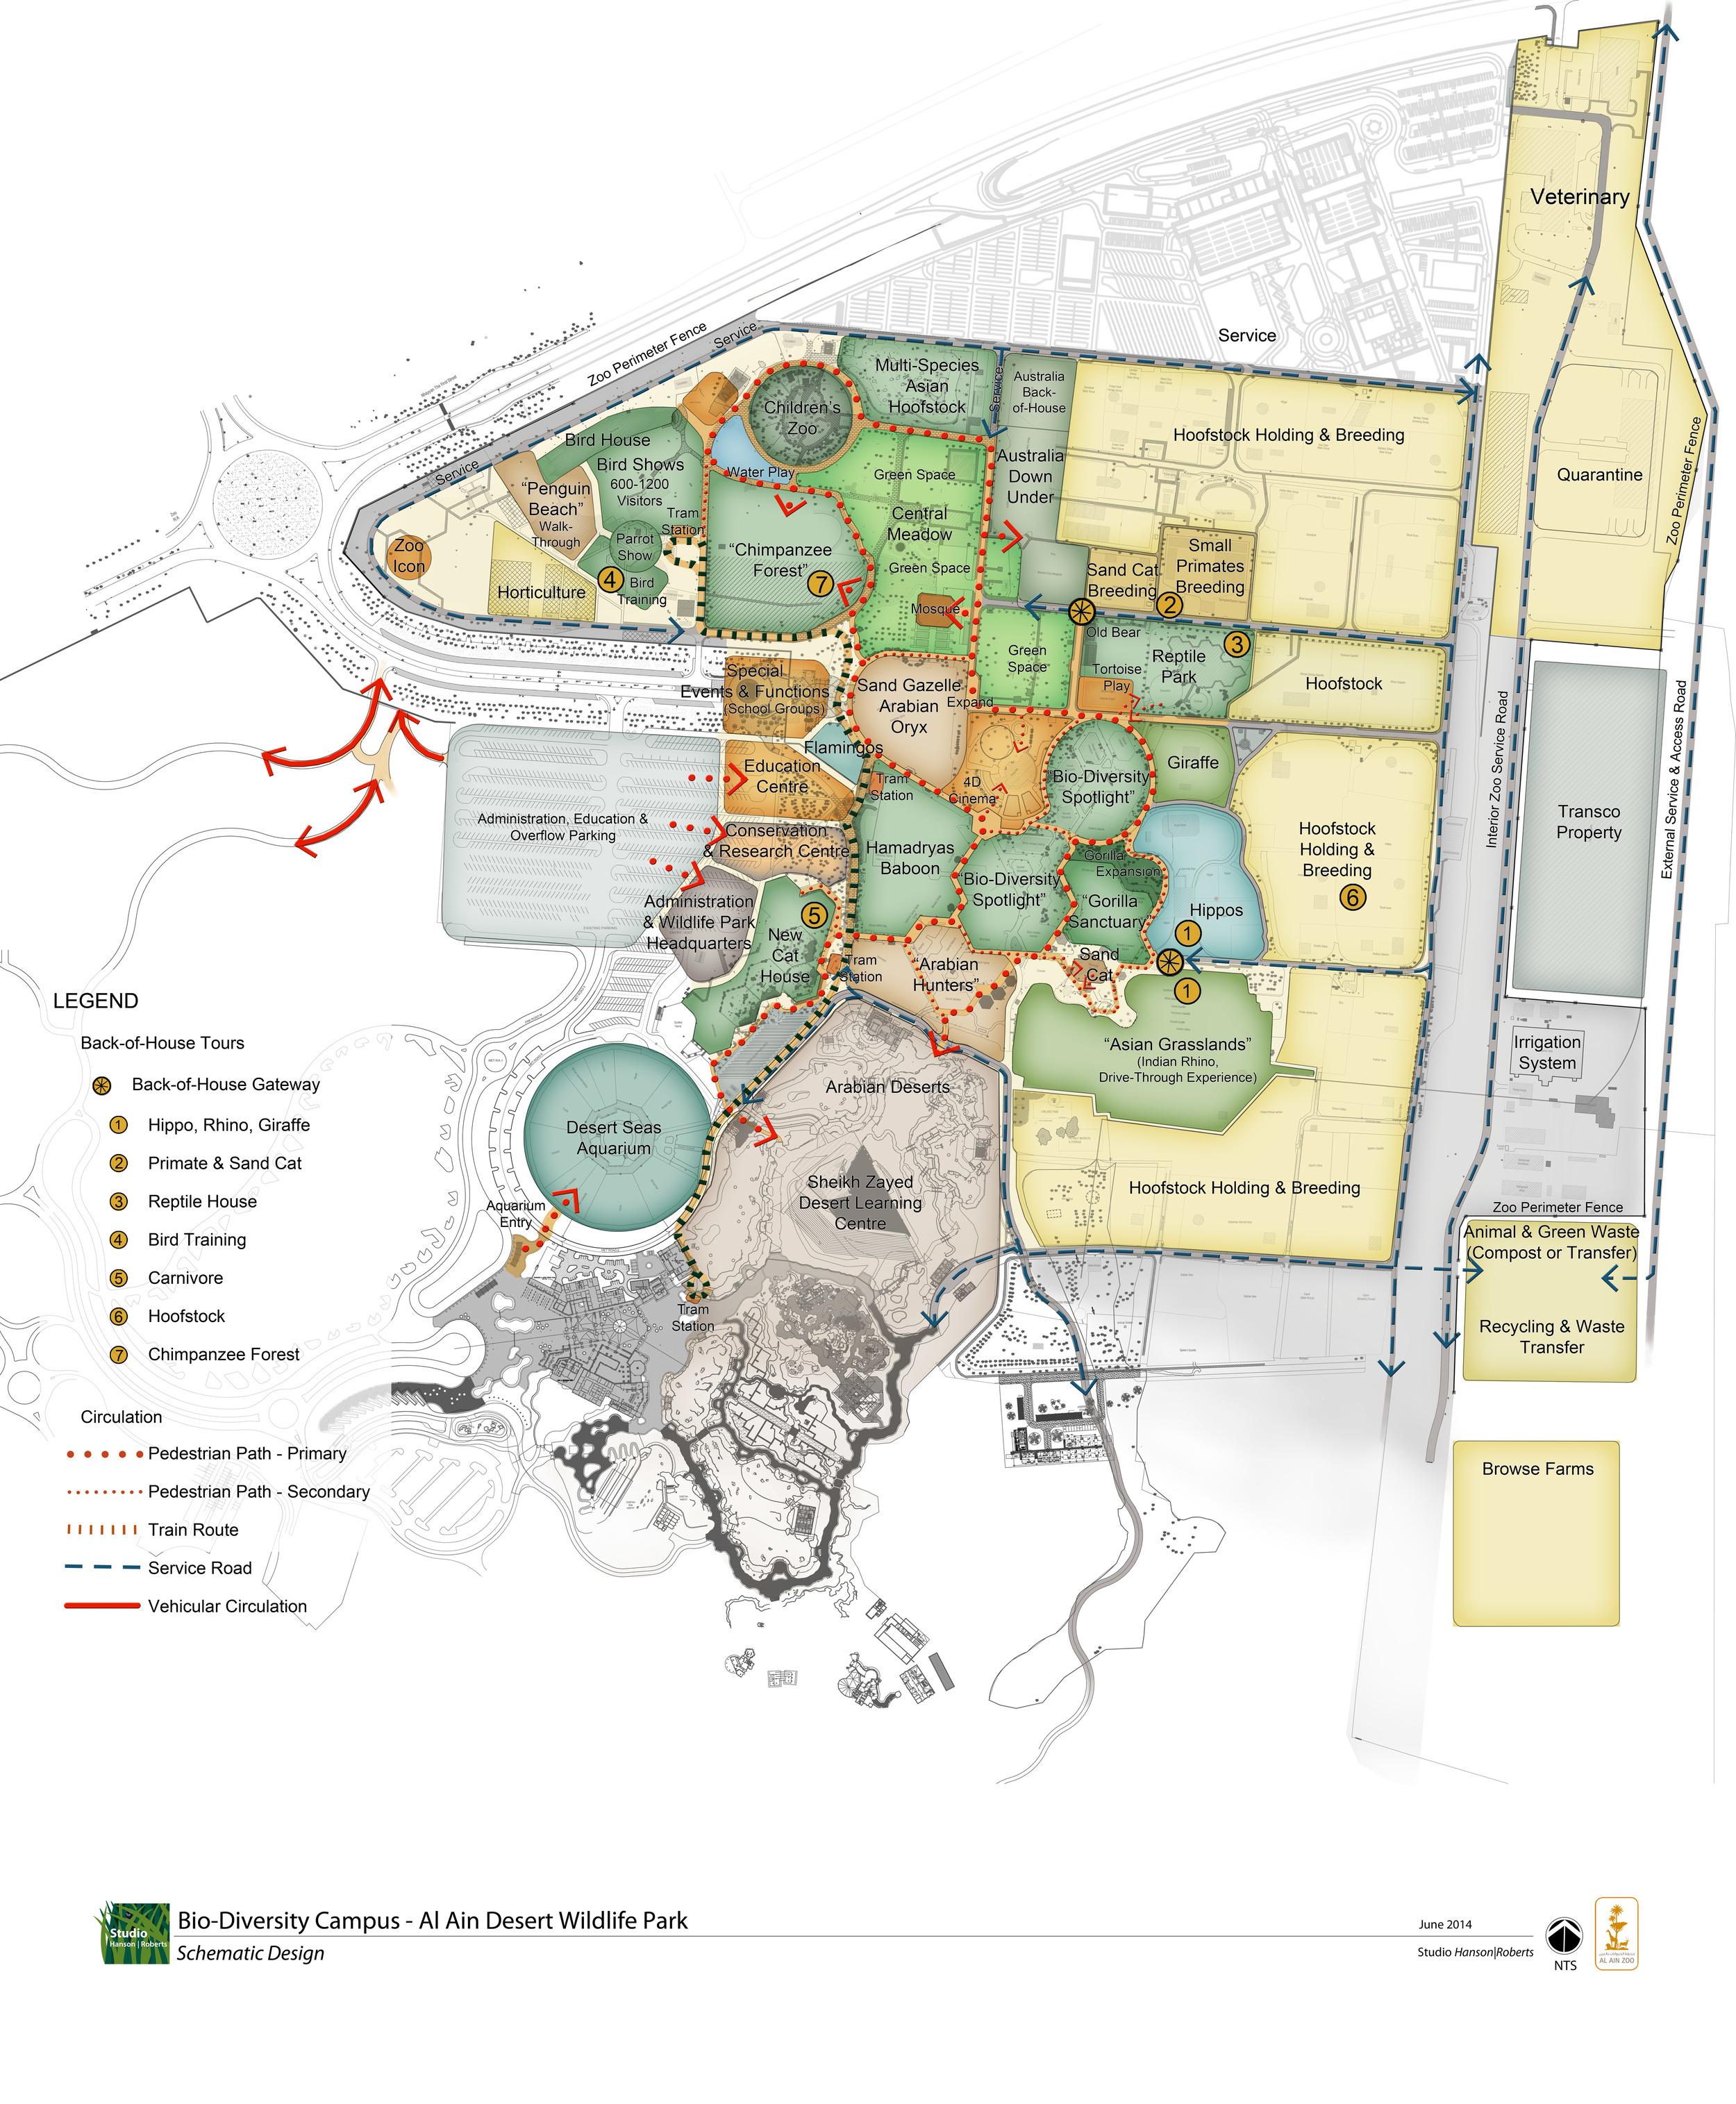 "Al Ain ""Biodiversity Campus"" Master Plan, 2014"